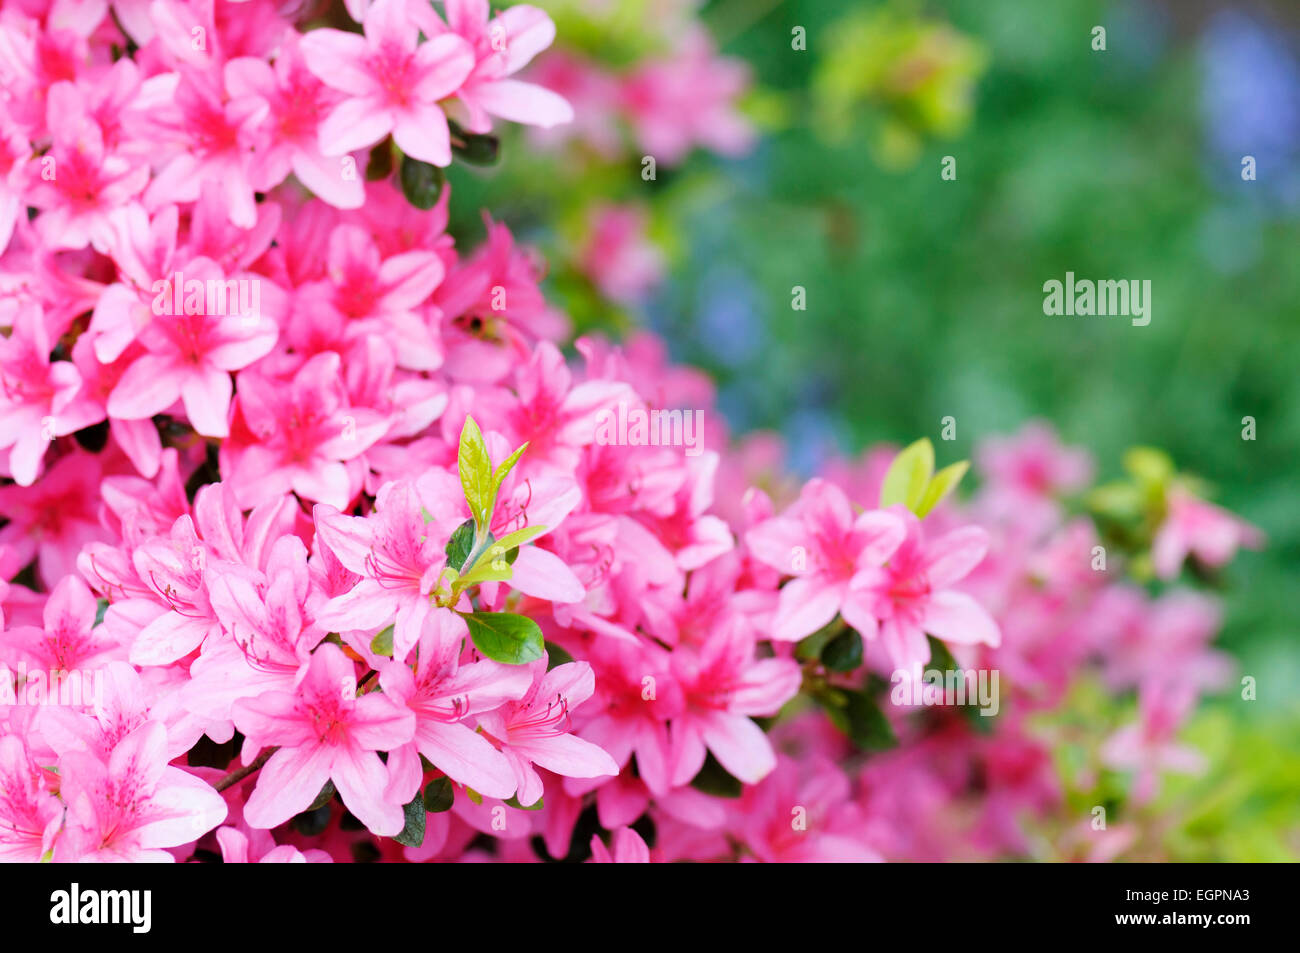 Azalea Rhododendron Pekoe Multiple Pink Flowers On A Bush With